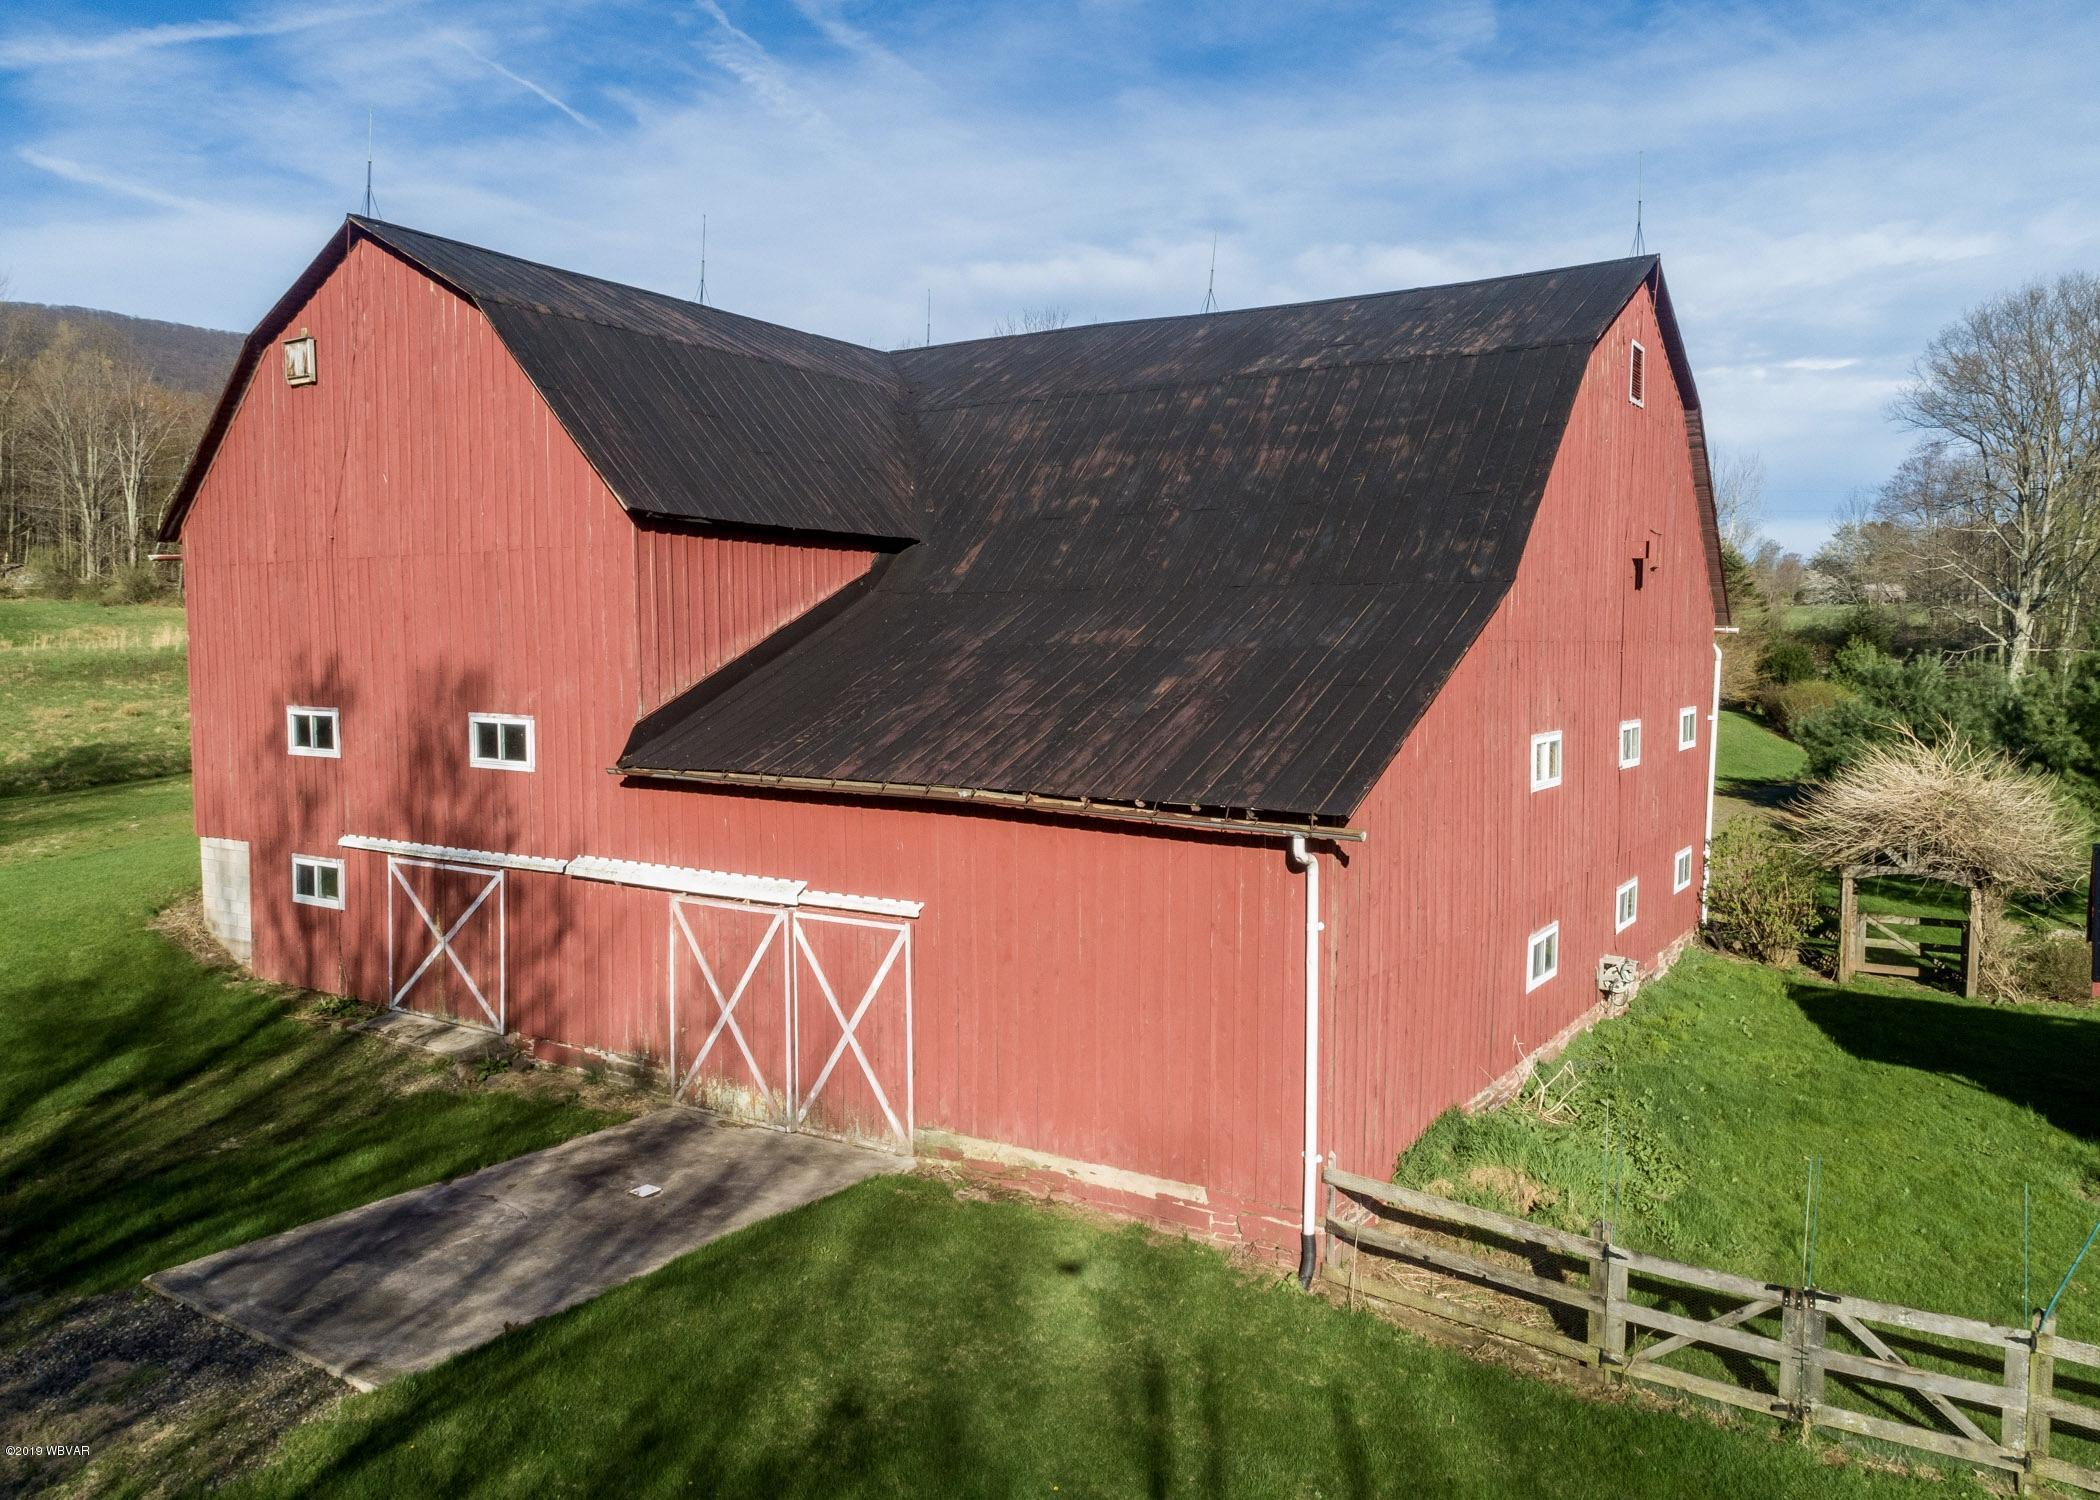 2391 LOGUE HILL ROAD,Unityville,PA 17774,5 Bedrooms Bedrooms,2 BathroomsBathrooms,Farm,LOGUE HILL,WB-87376